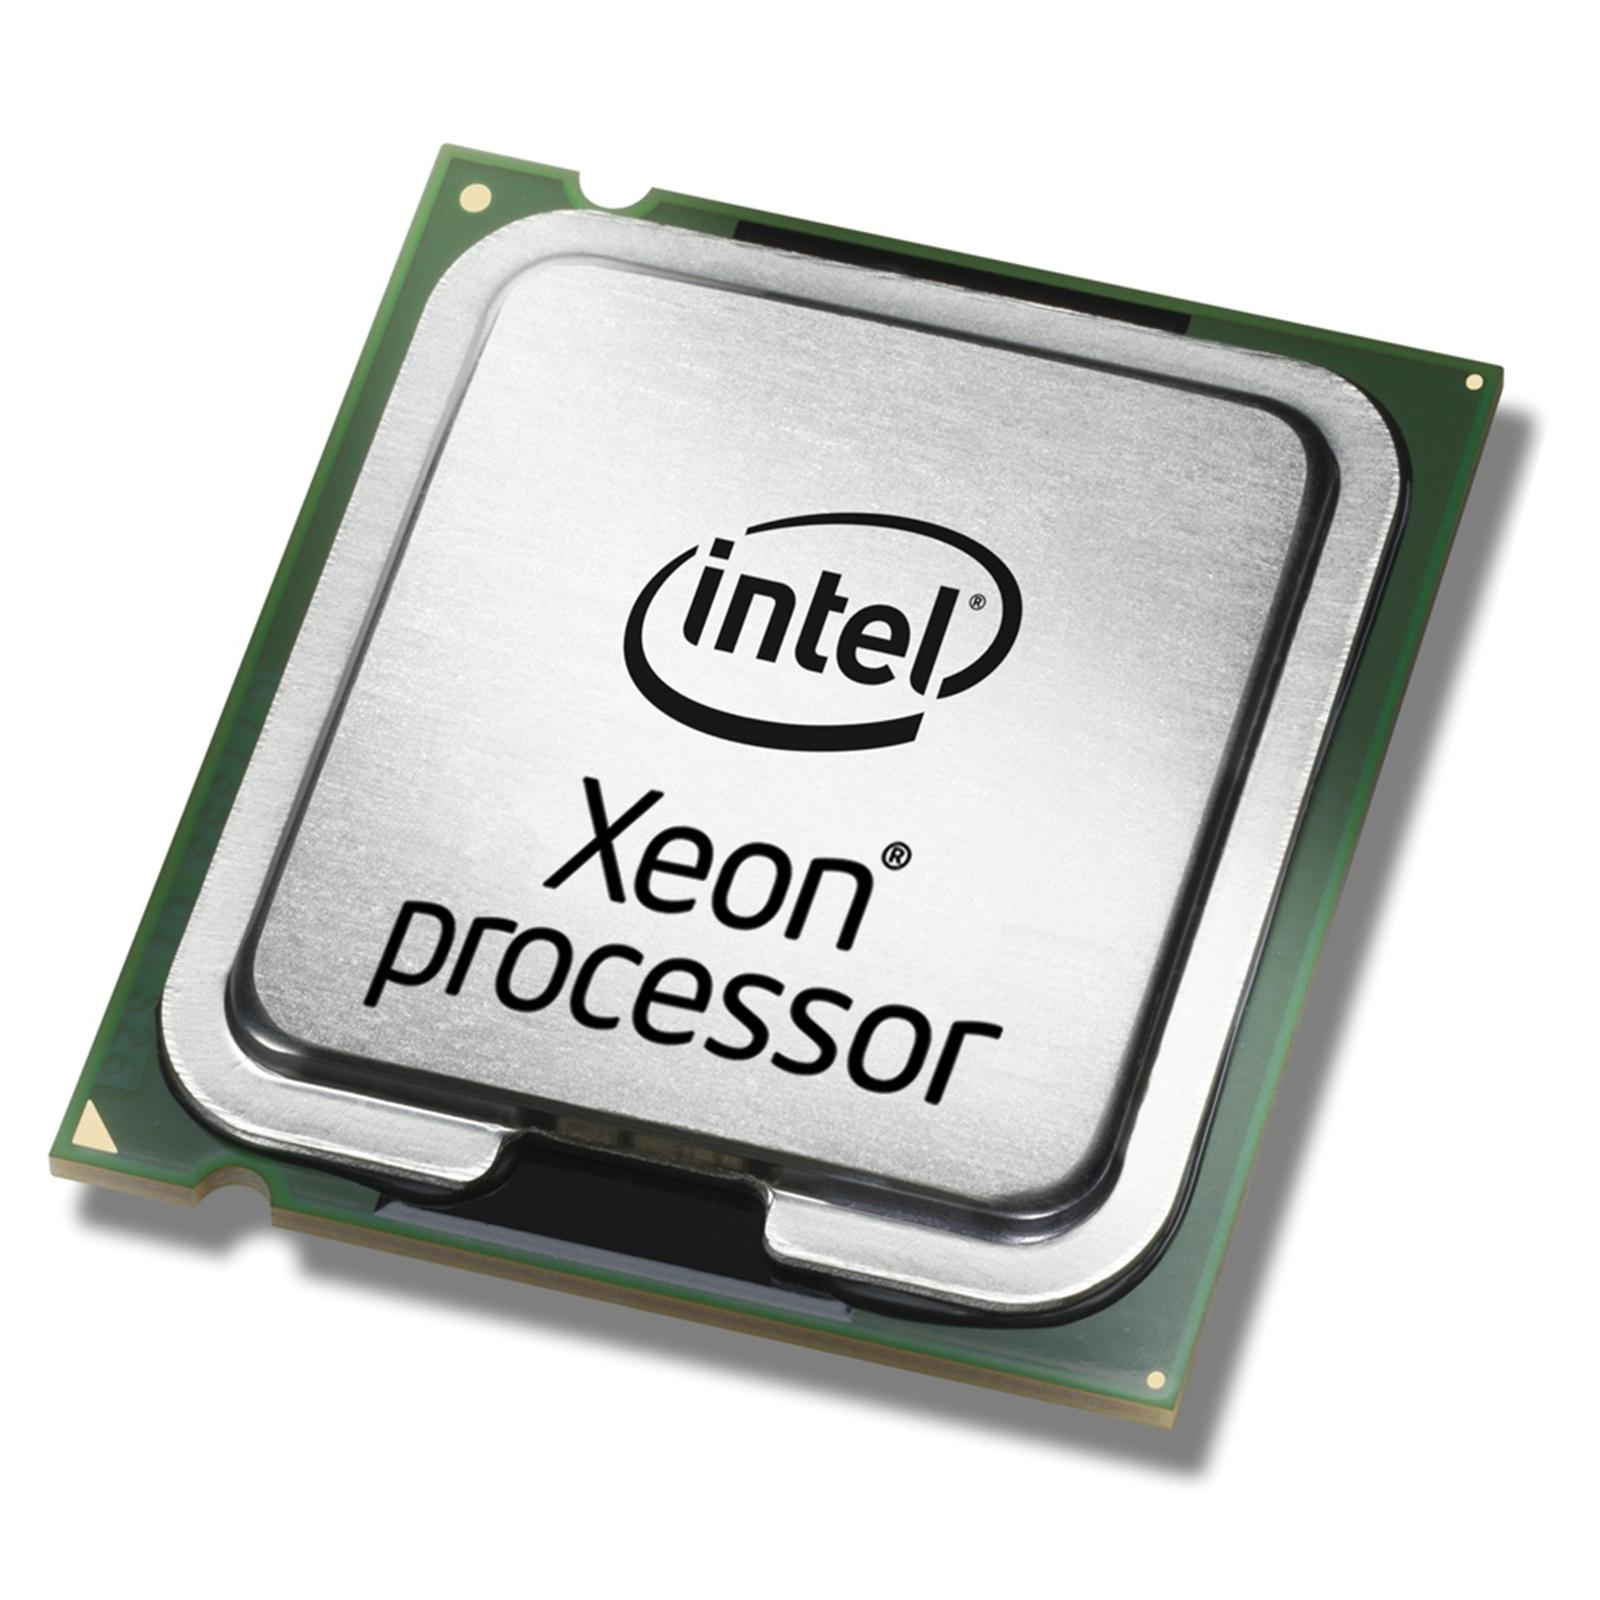 Exp Intel Xeon Proc E5-2640 v2 8C 2.0GHz 20MB C 1600MHz 95W